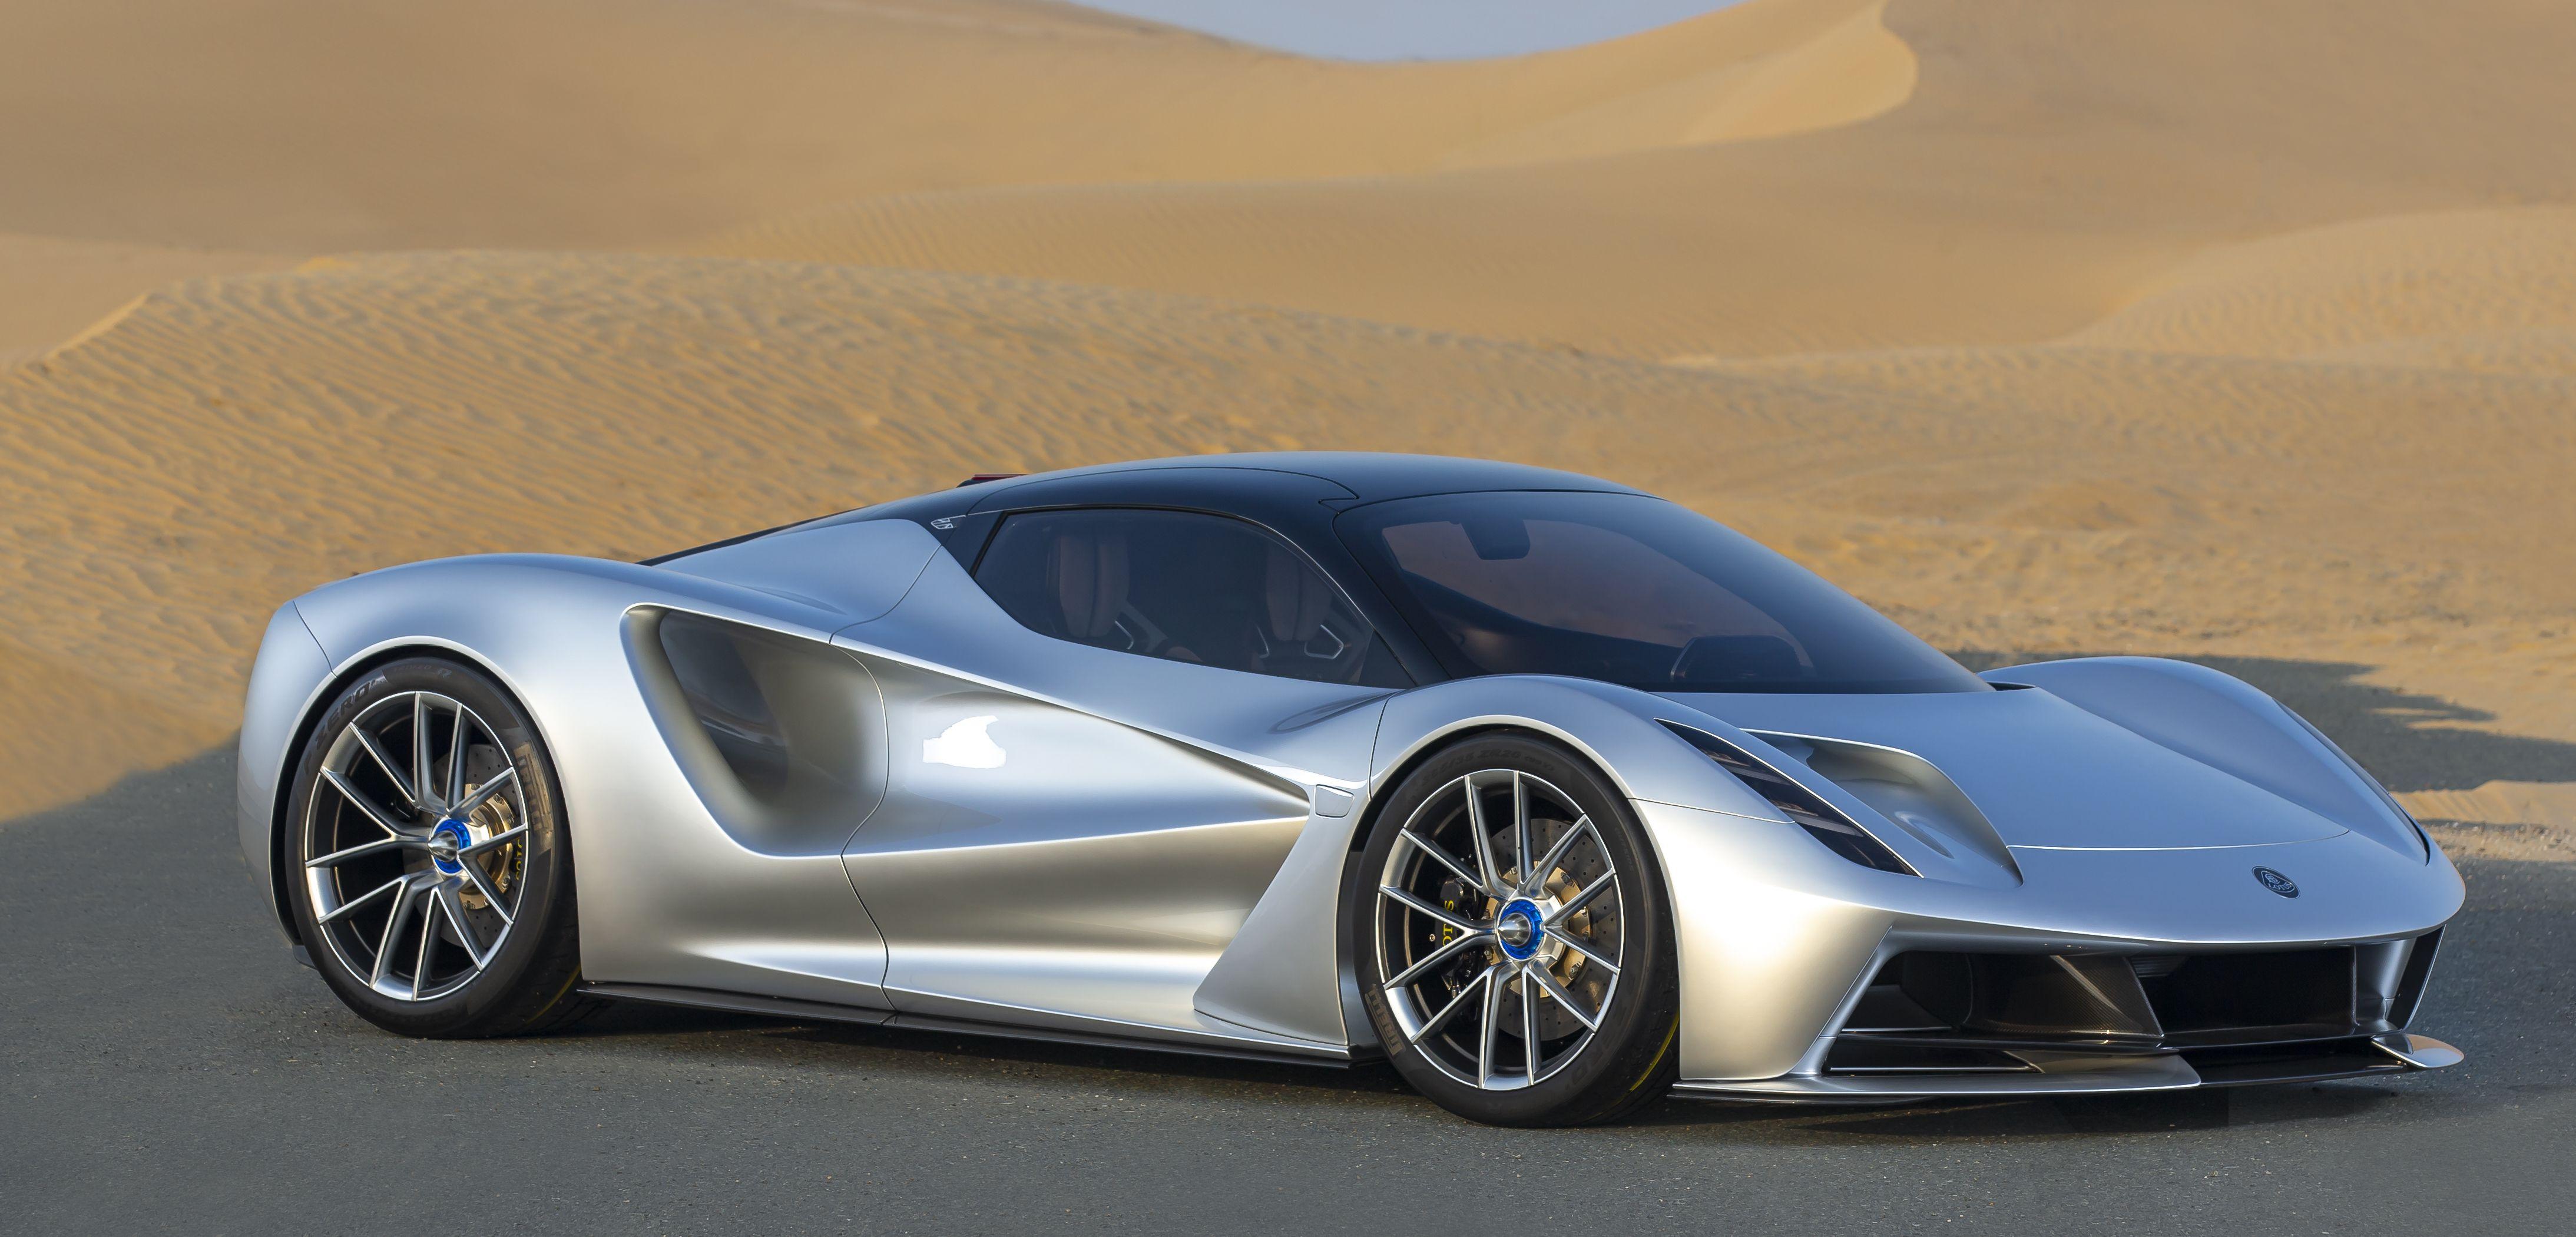 2020 Lotus Evija Lotus S Big Step Into The Supercar World In 2020 Superauto Autozeitung E Motor